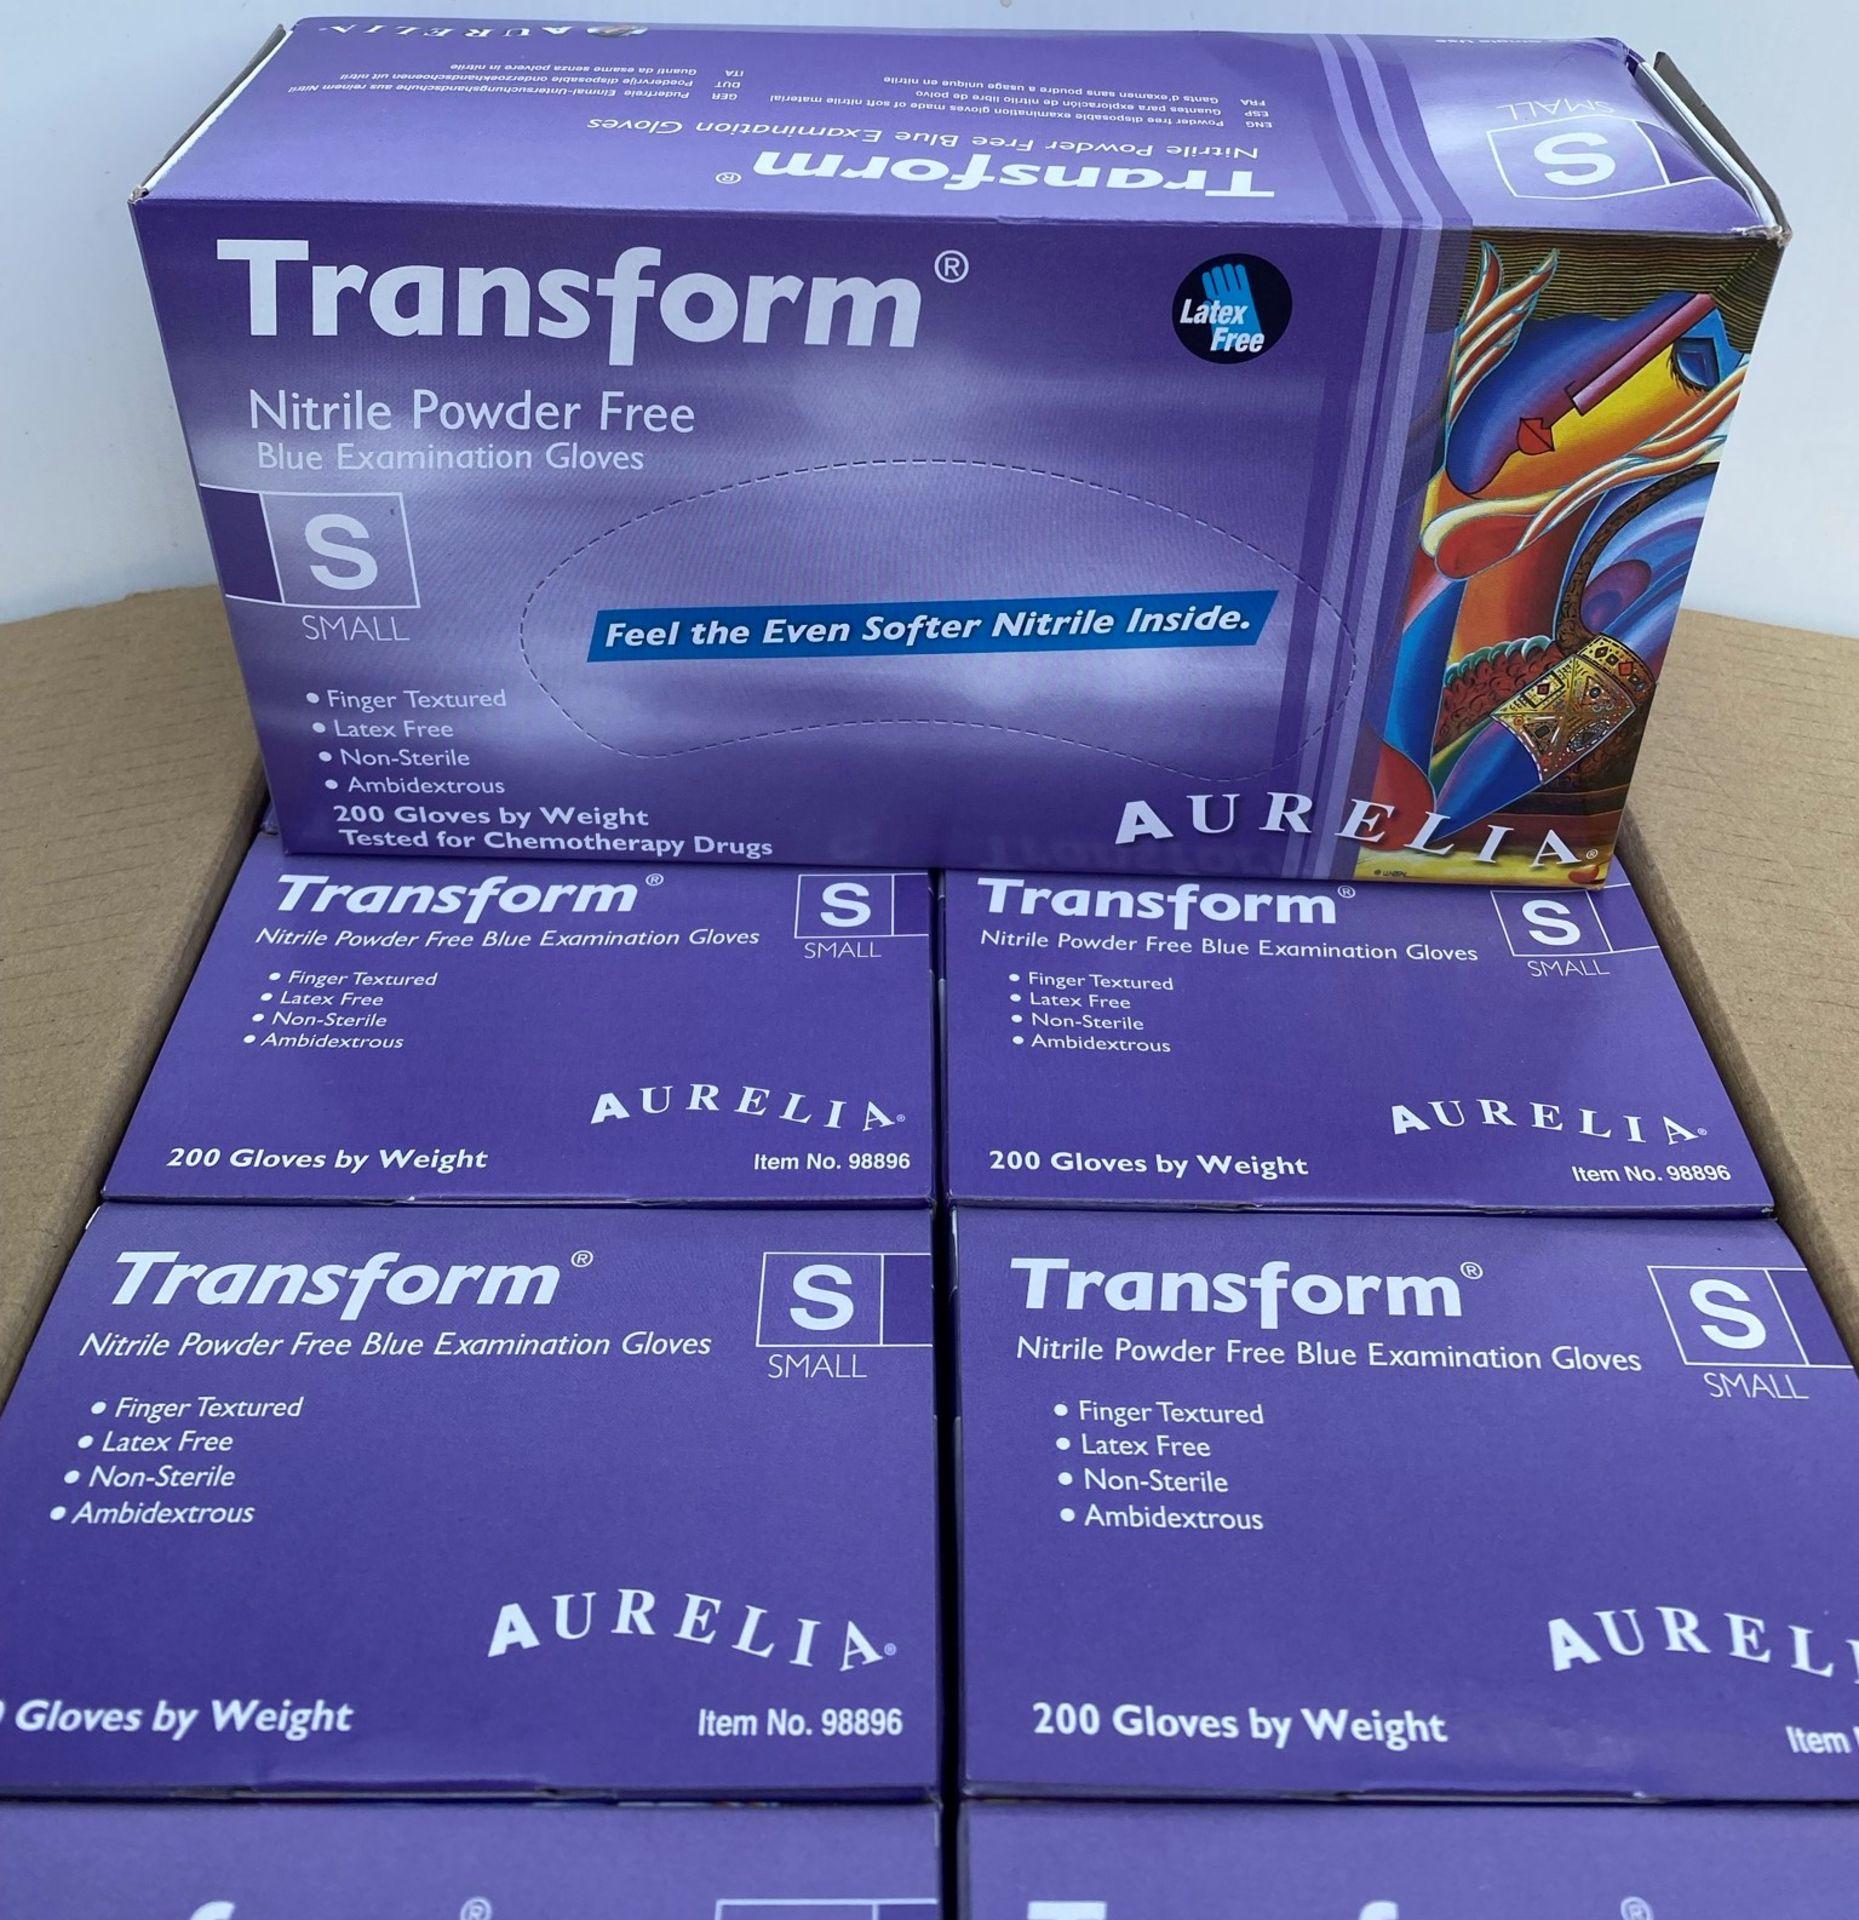 10 x boxes of 200 x Aurelia Transform Nitrile Powder Free Blue Examination Gloves - Size Small - - Image 3 of 4